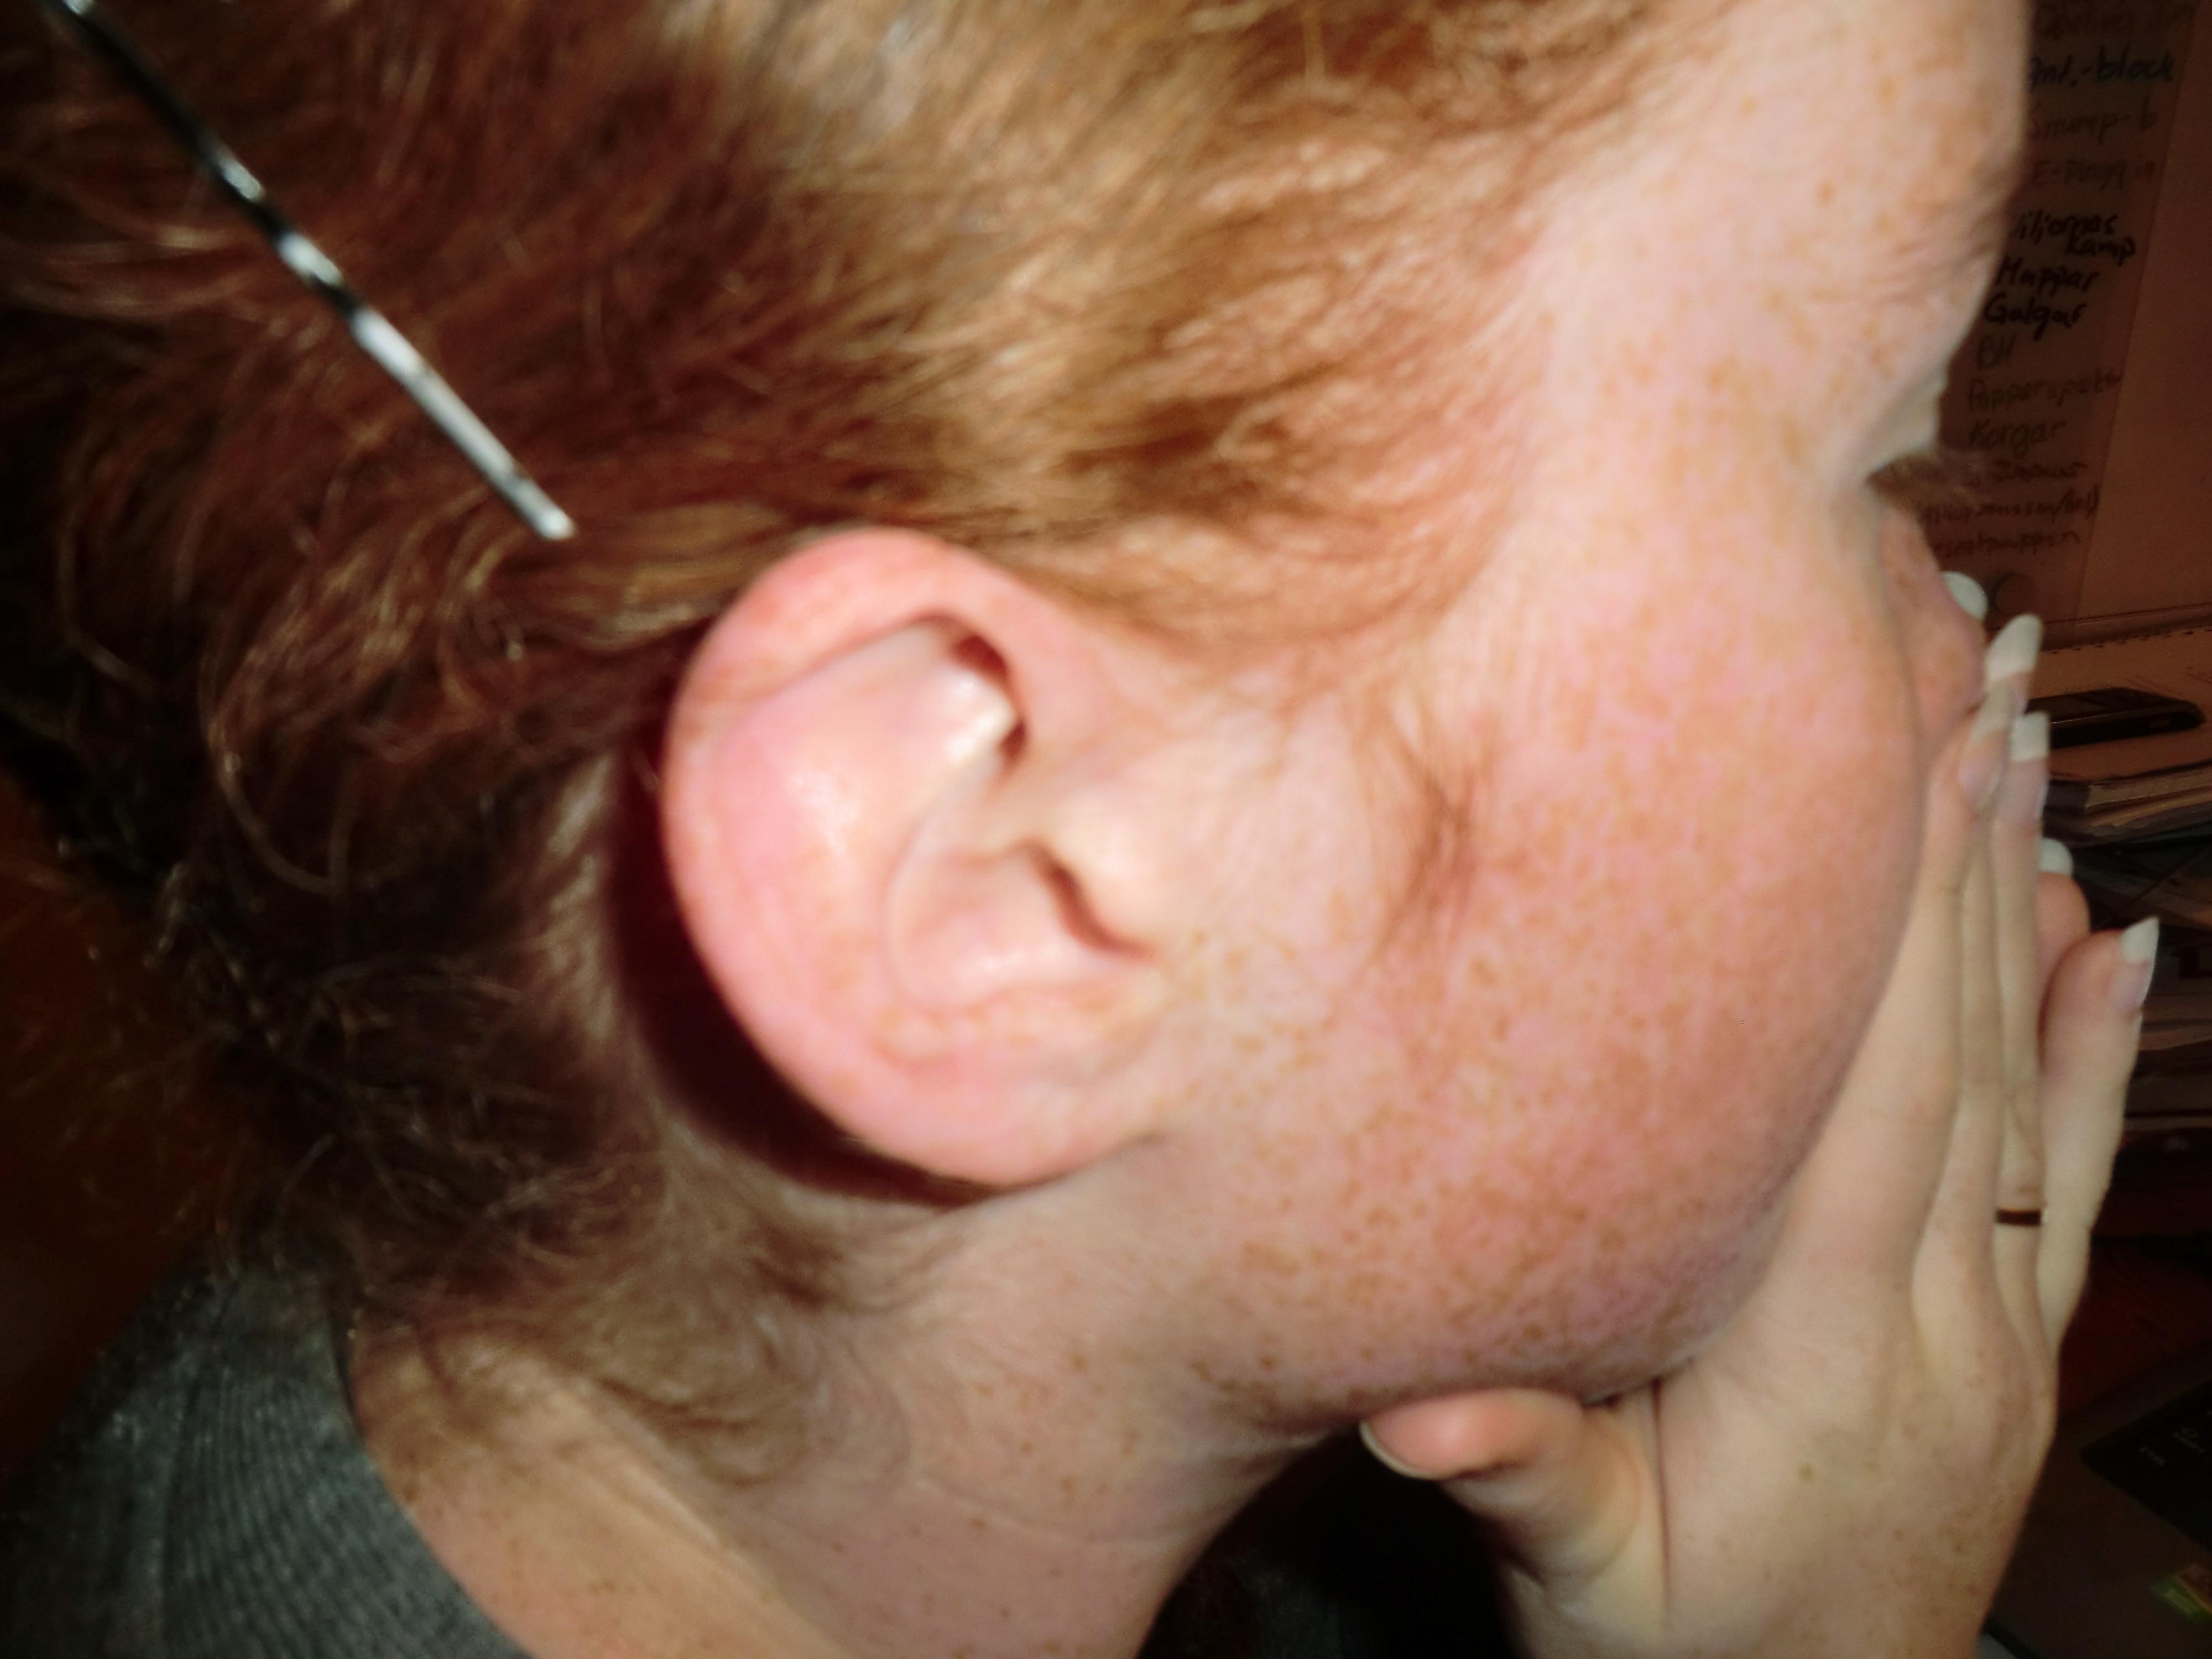 Homeopati bättre än antibiotika vid akut öroninflammation